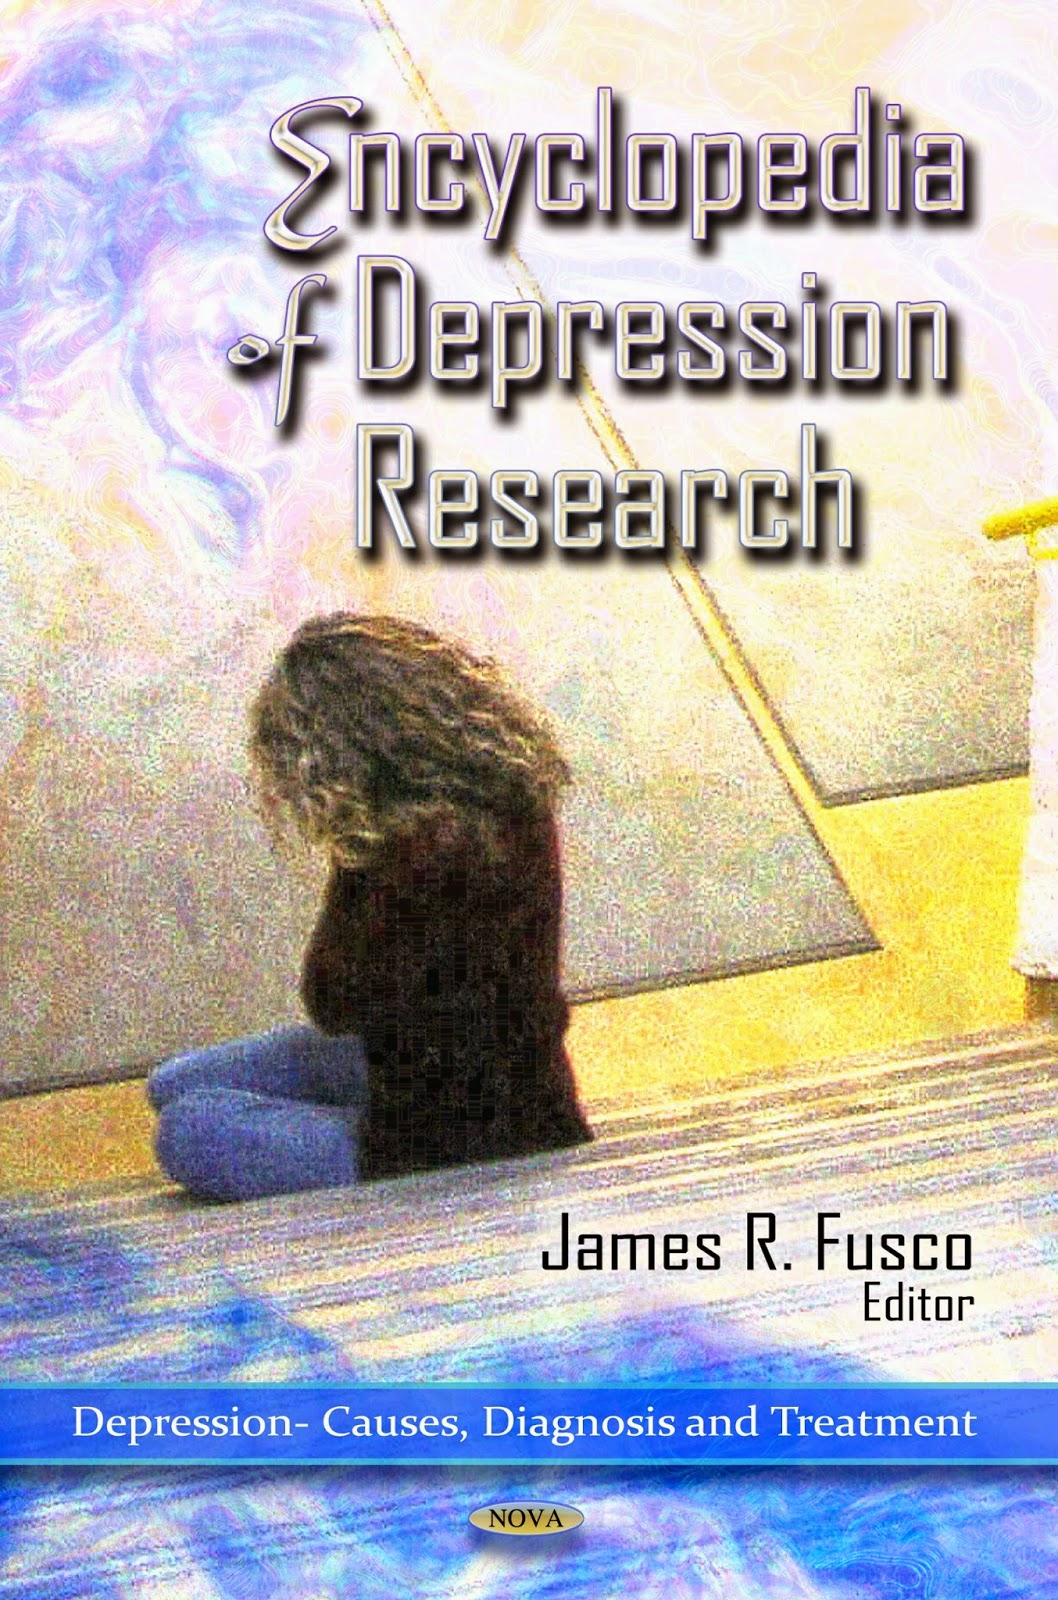 http://www.kingcheapebooks.com/2015/01/encyclopedia-of-depression-research.html